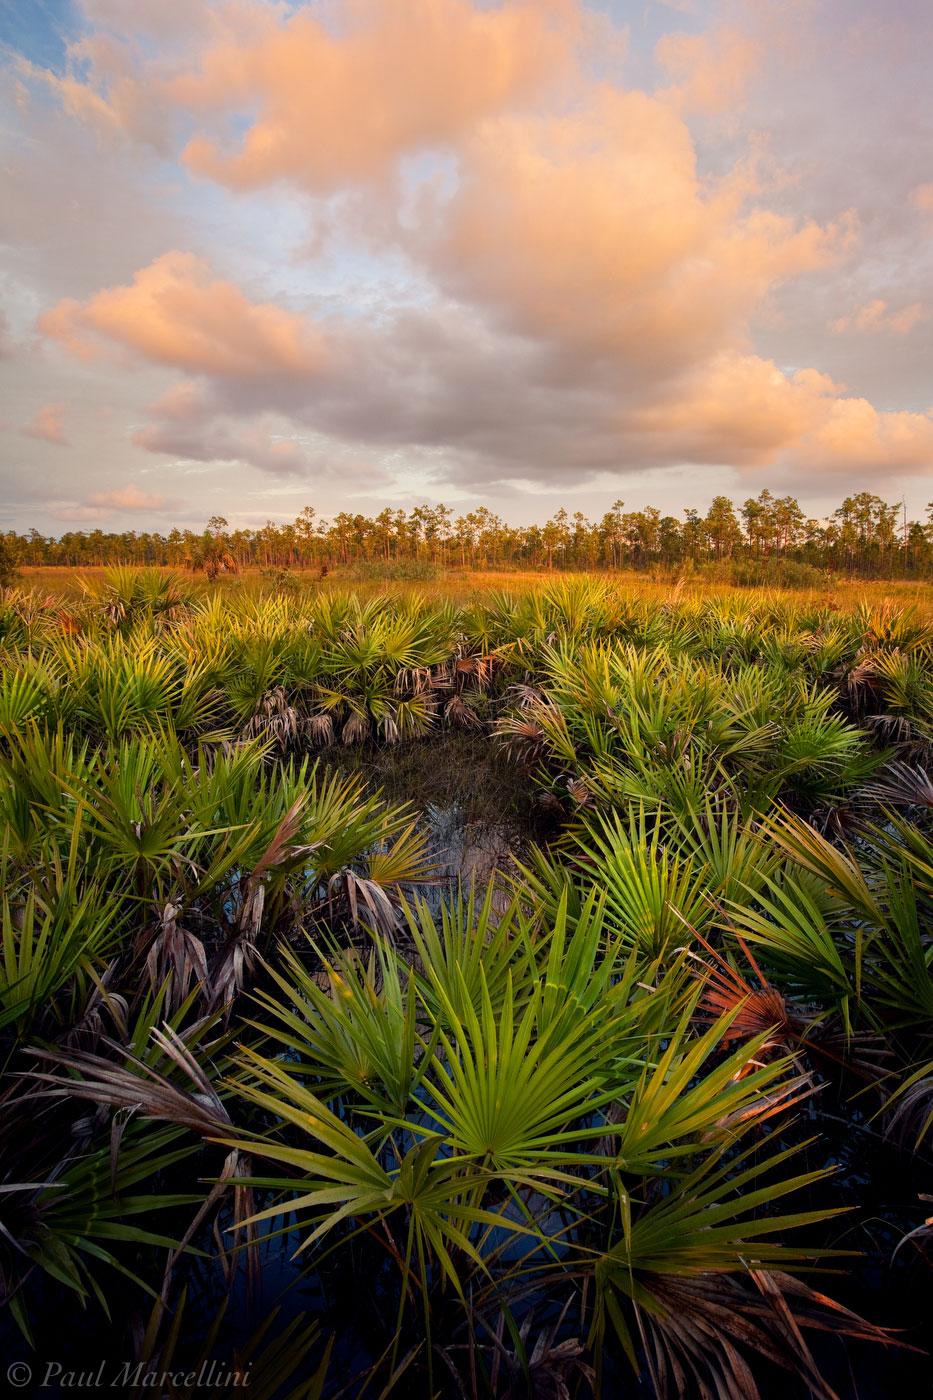 everglades, palmetto, serenoa repens, sunset, Florida, nature, photography, florida national parks, photo